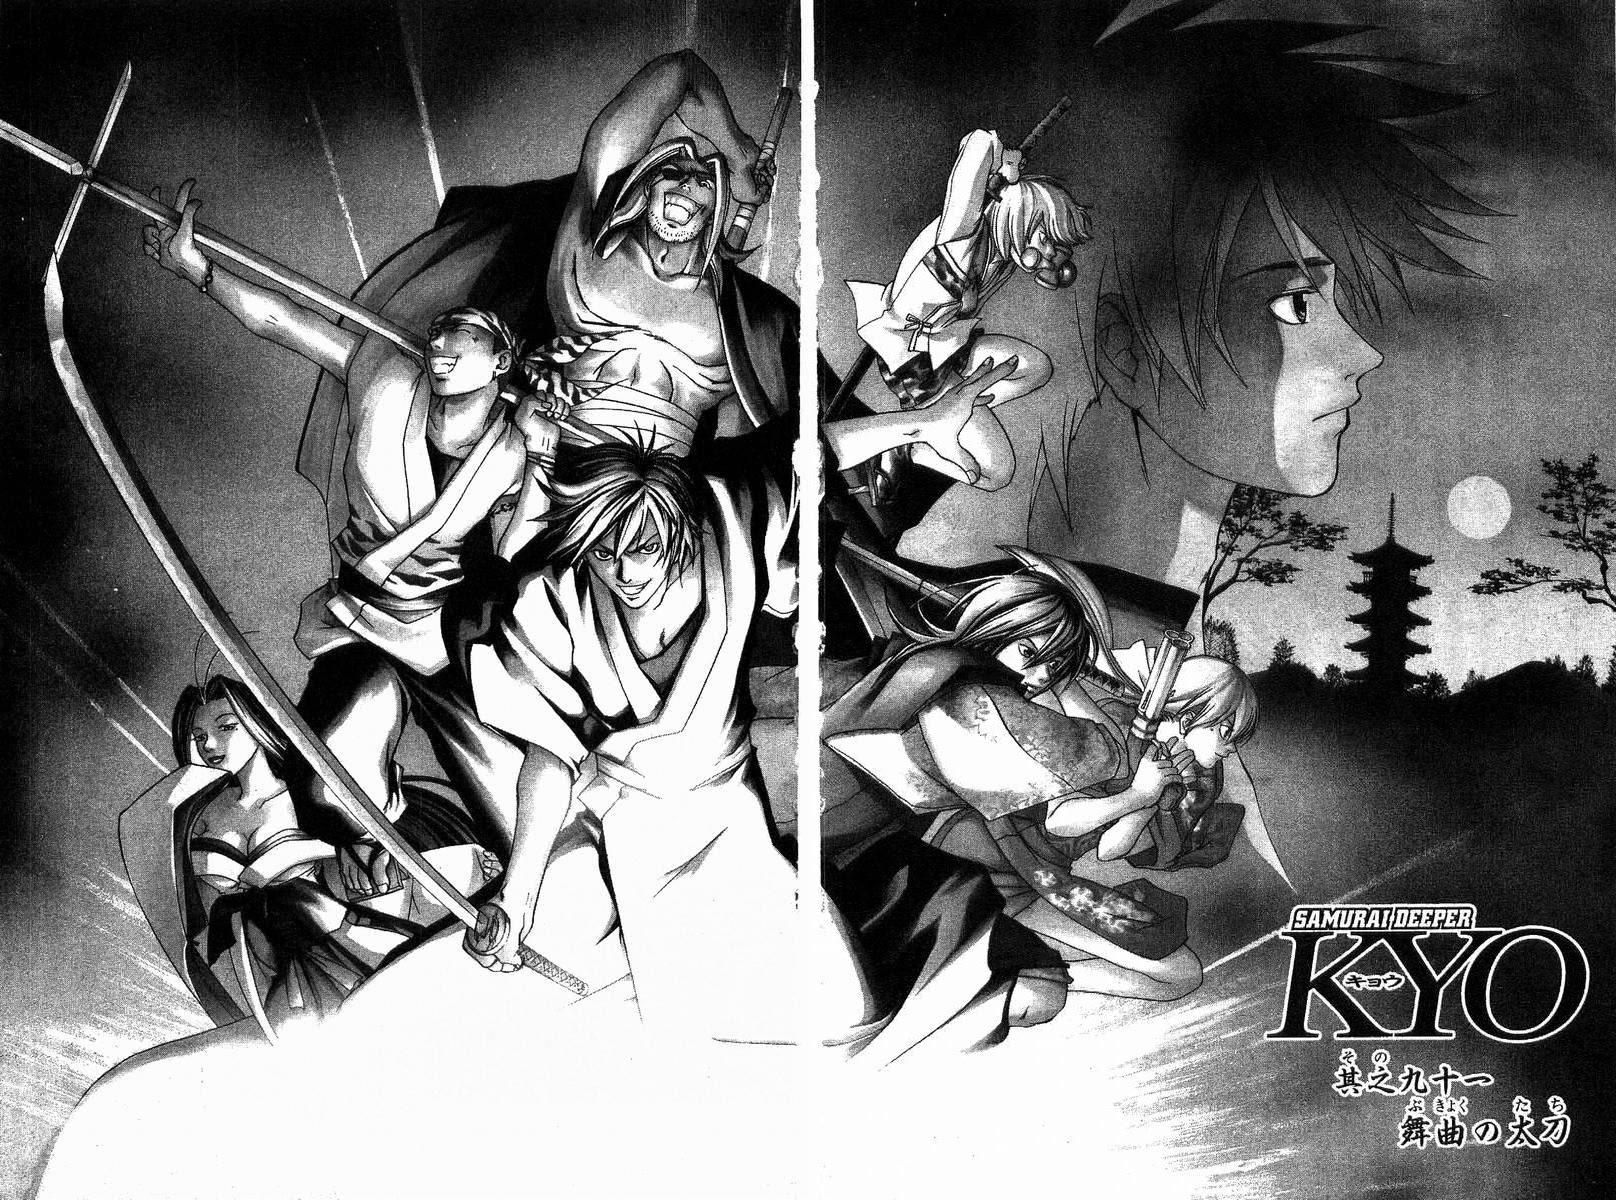 Mắt Quỷ Kyo-Samurai Deeper Kyo chap 91 Trang 12